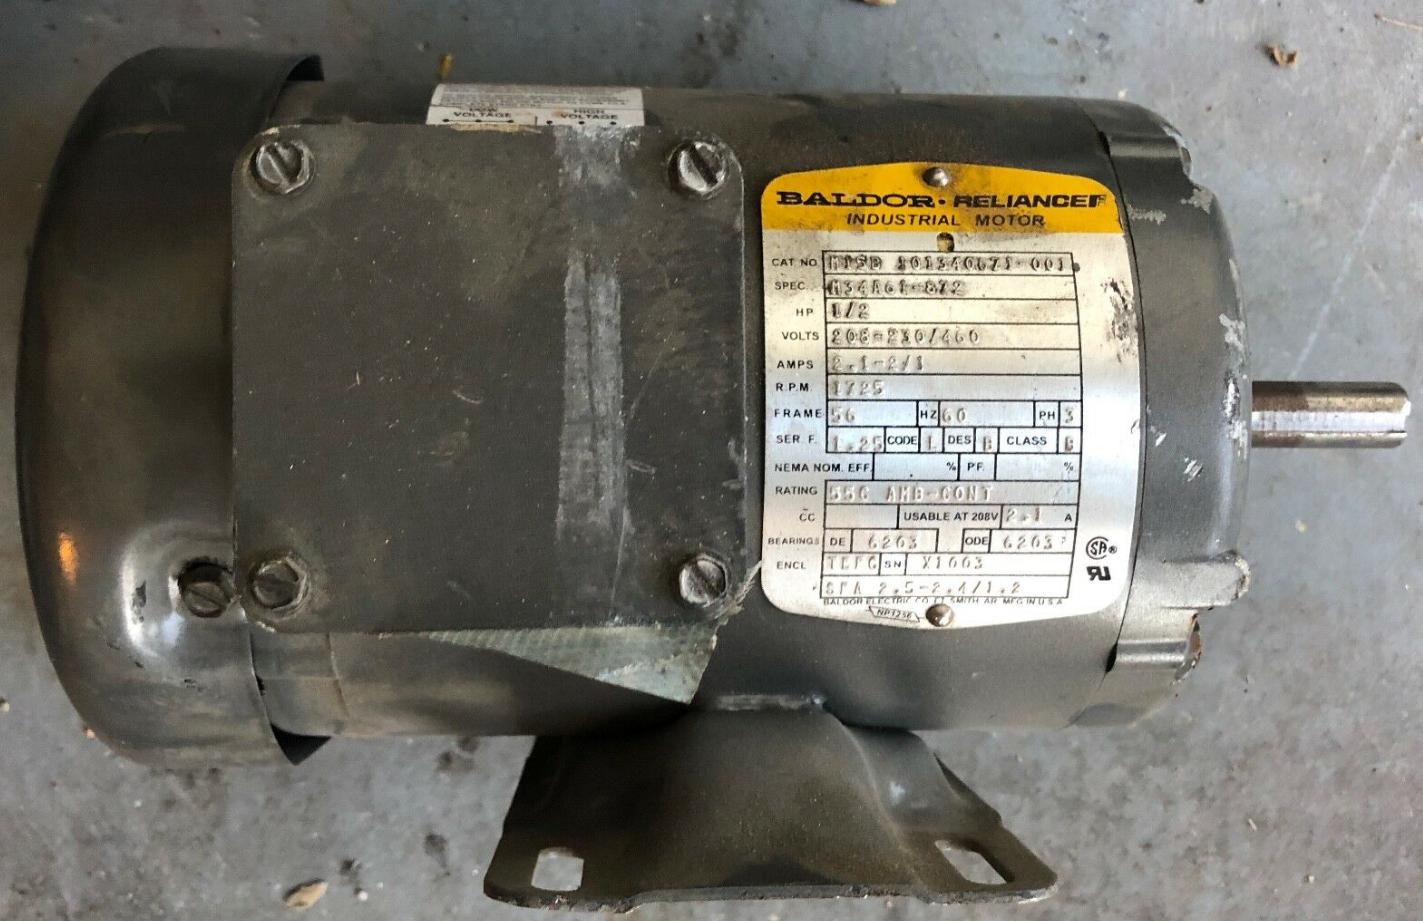 Lot 1L - BALDOR INDUSTRIAL RELIANCE MOTOR 1725 RPM M15B 101340671-001